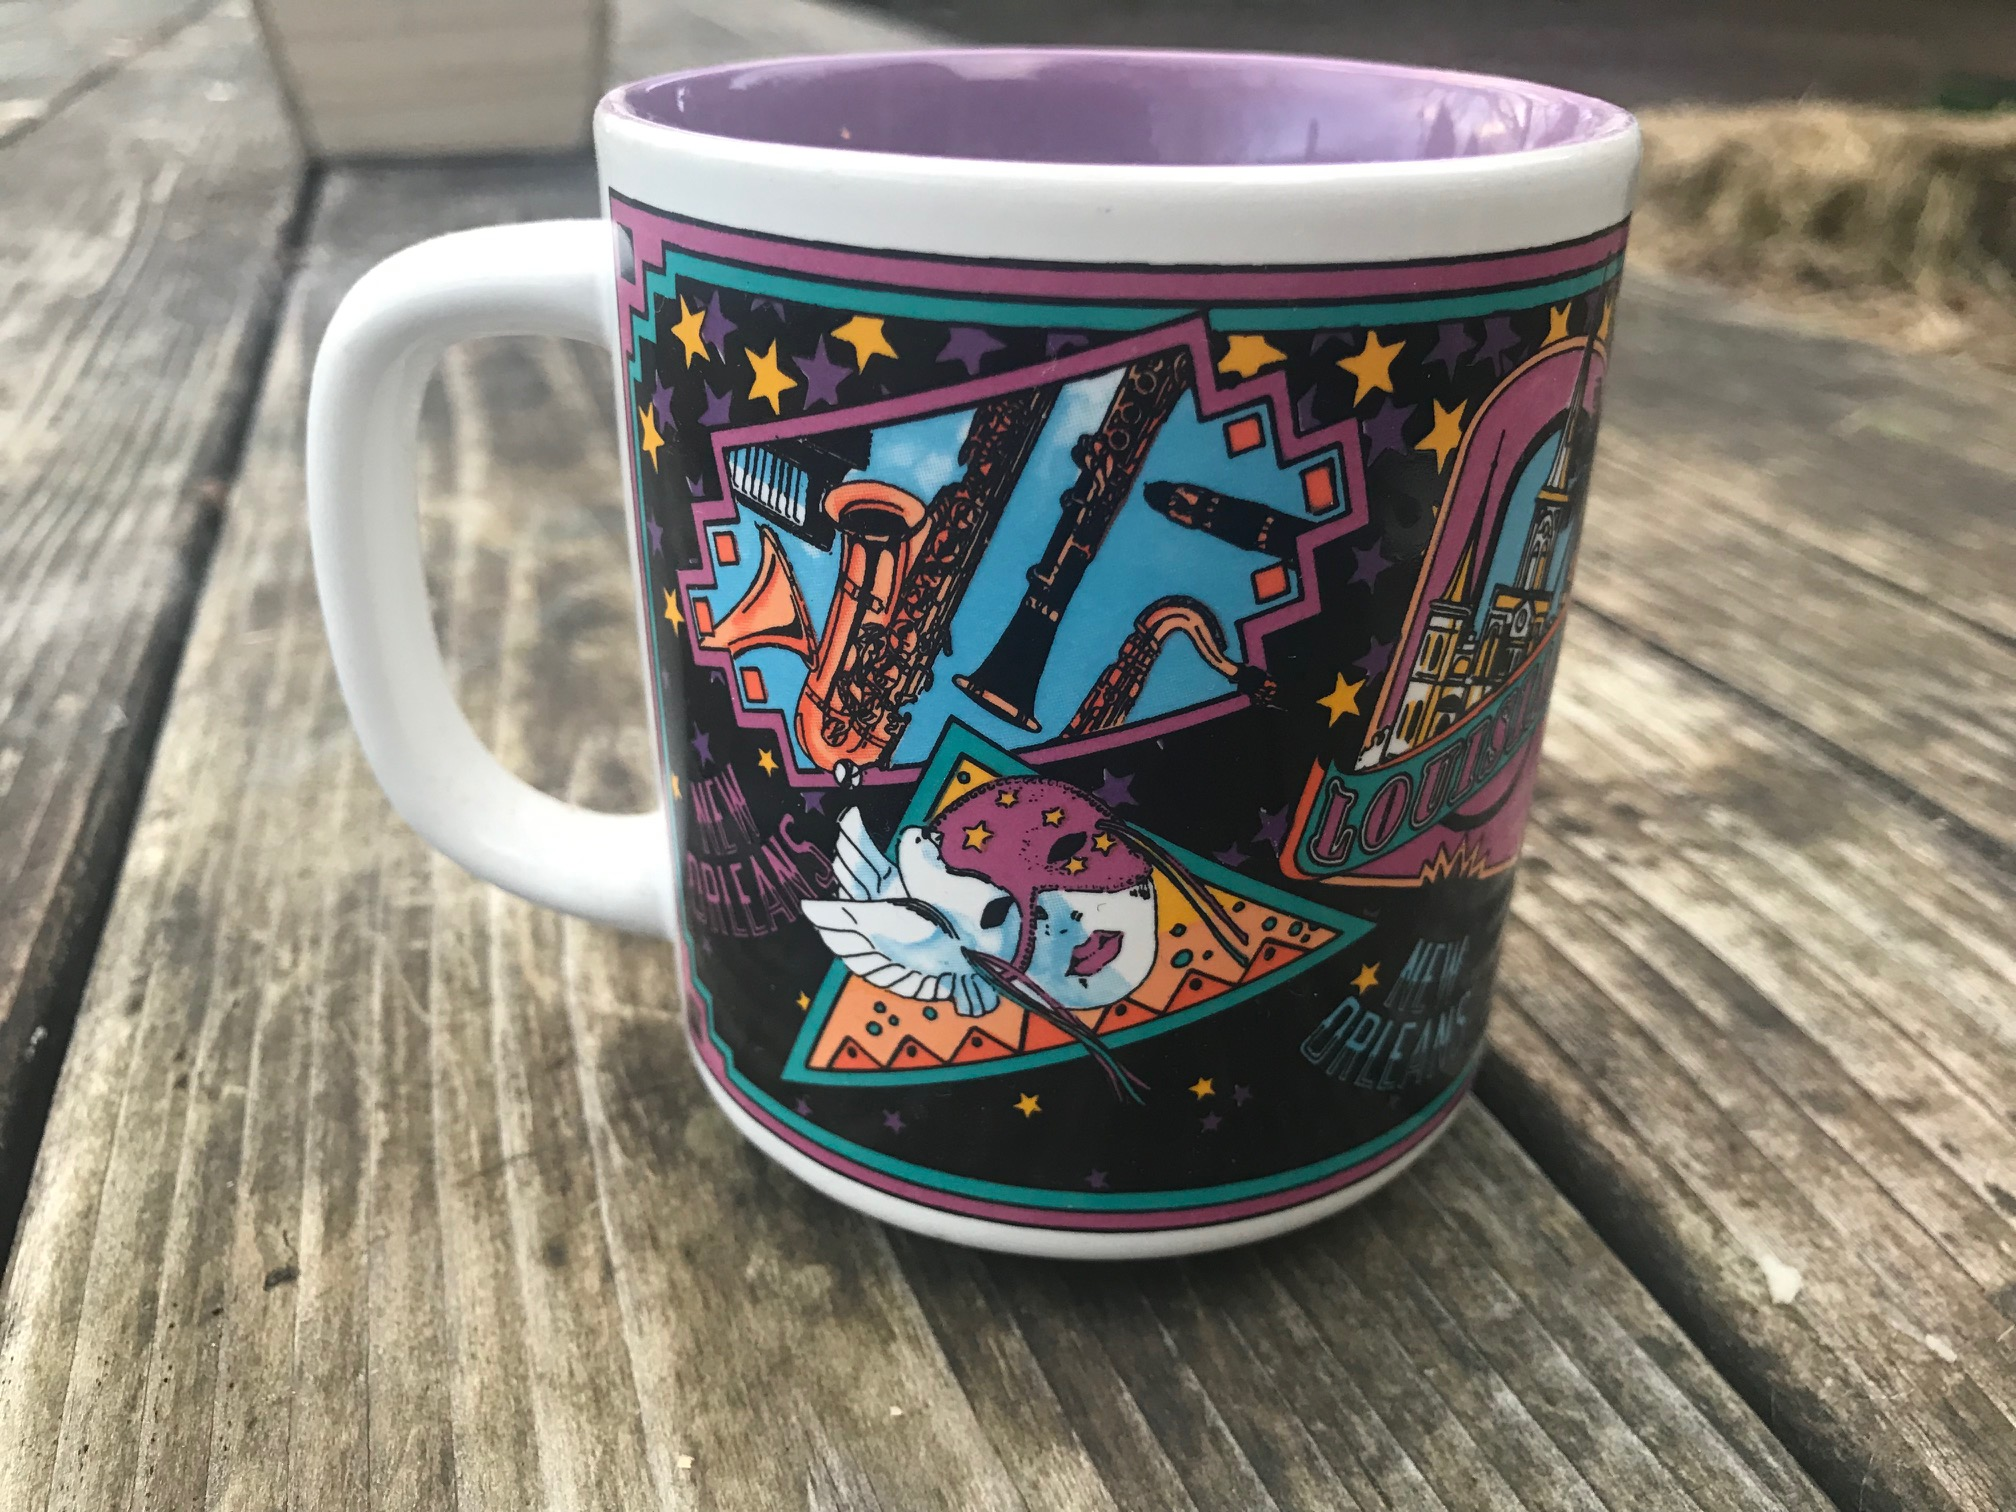 2018 New Orleans Souvenir Mug: 16,700 ppm Lead, 109 ppm Cadmium.